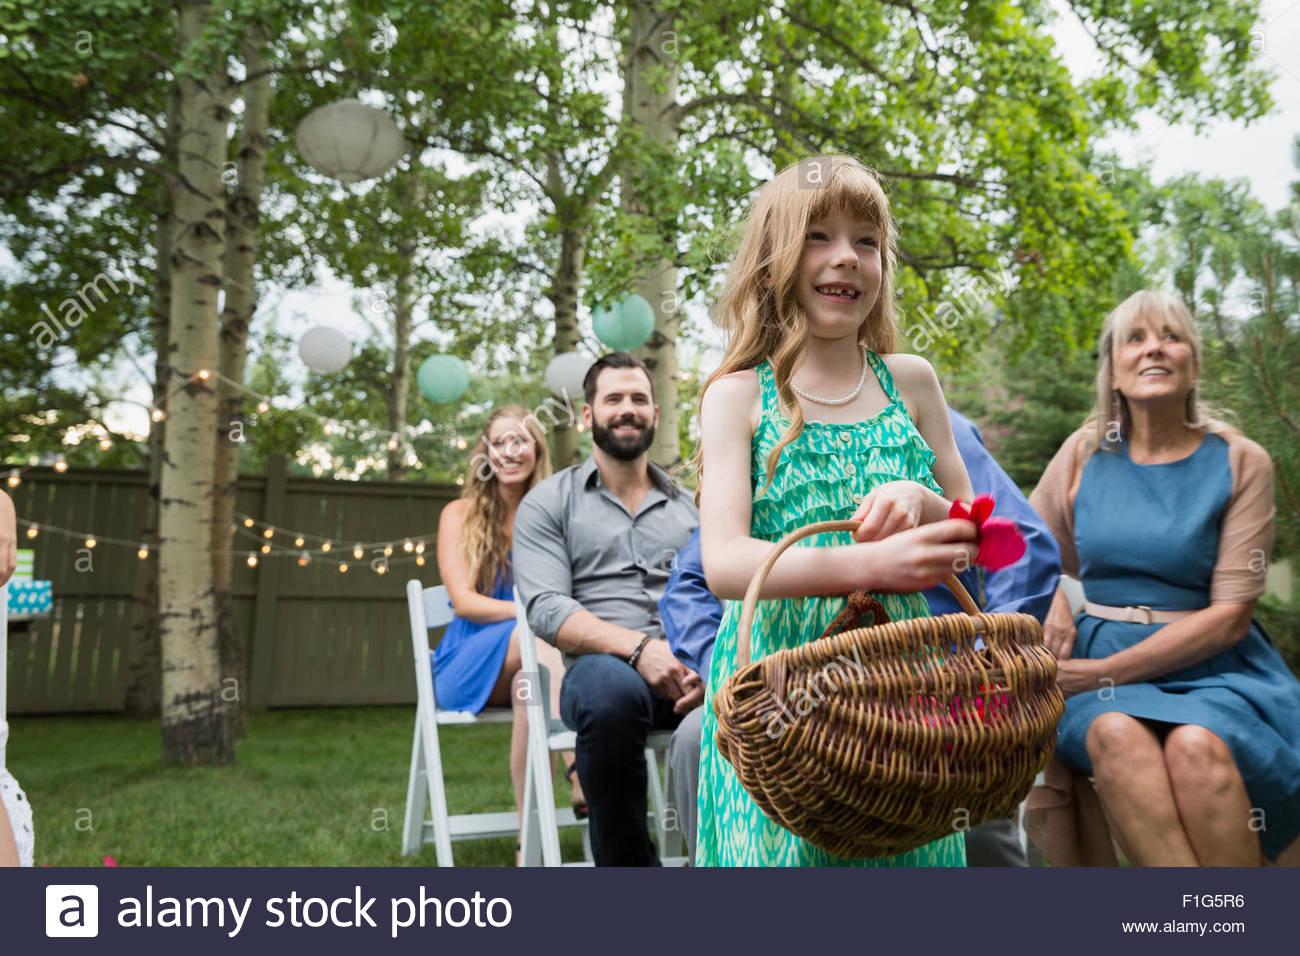 Smiling flower girl with basket at backyard wedding - Stock Image